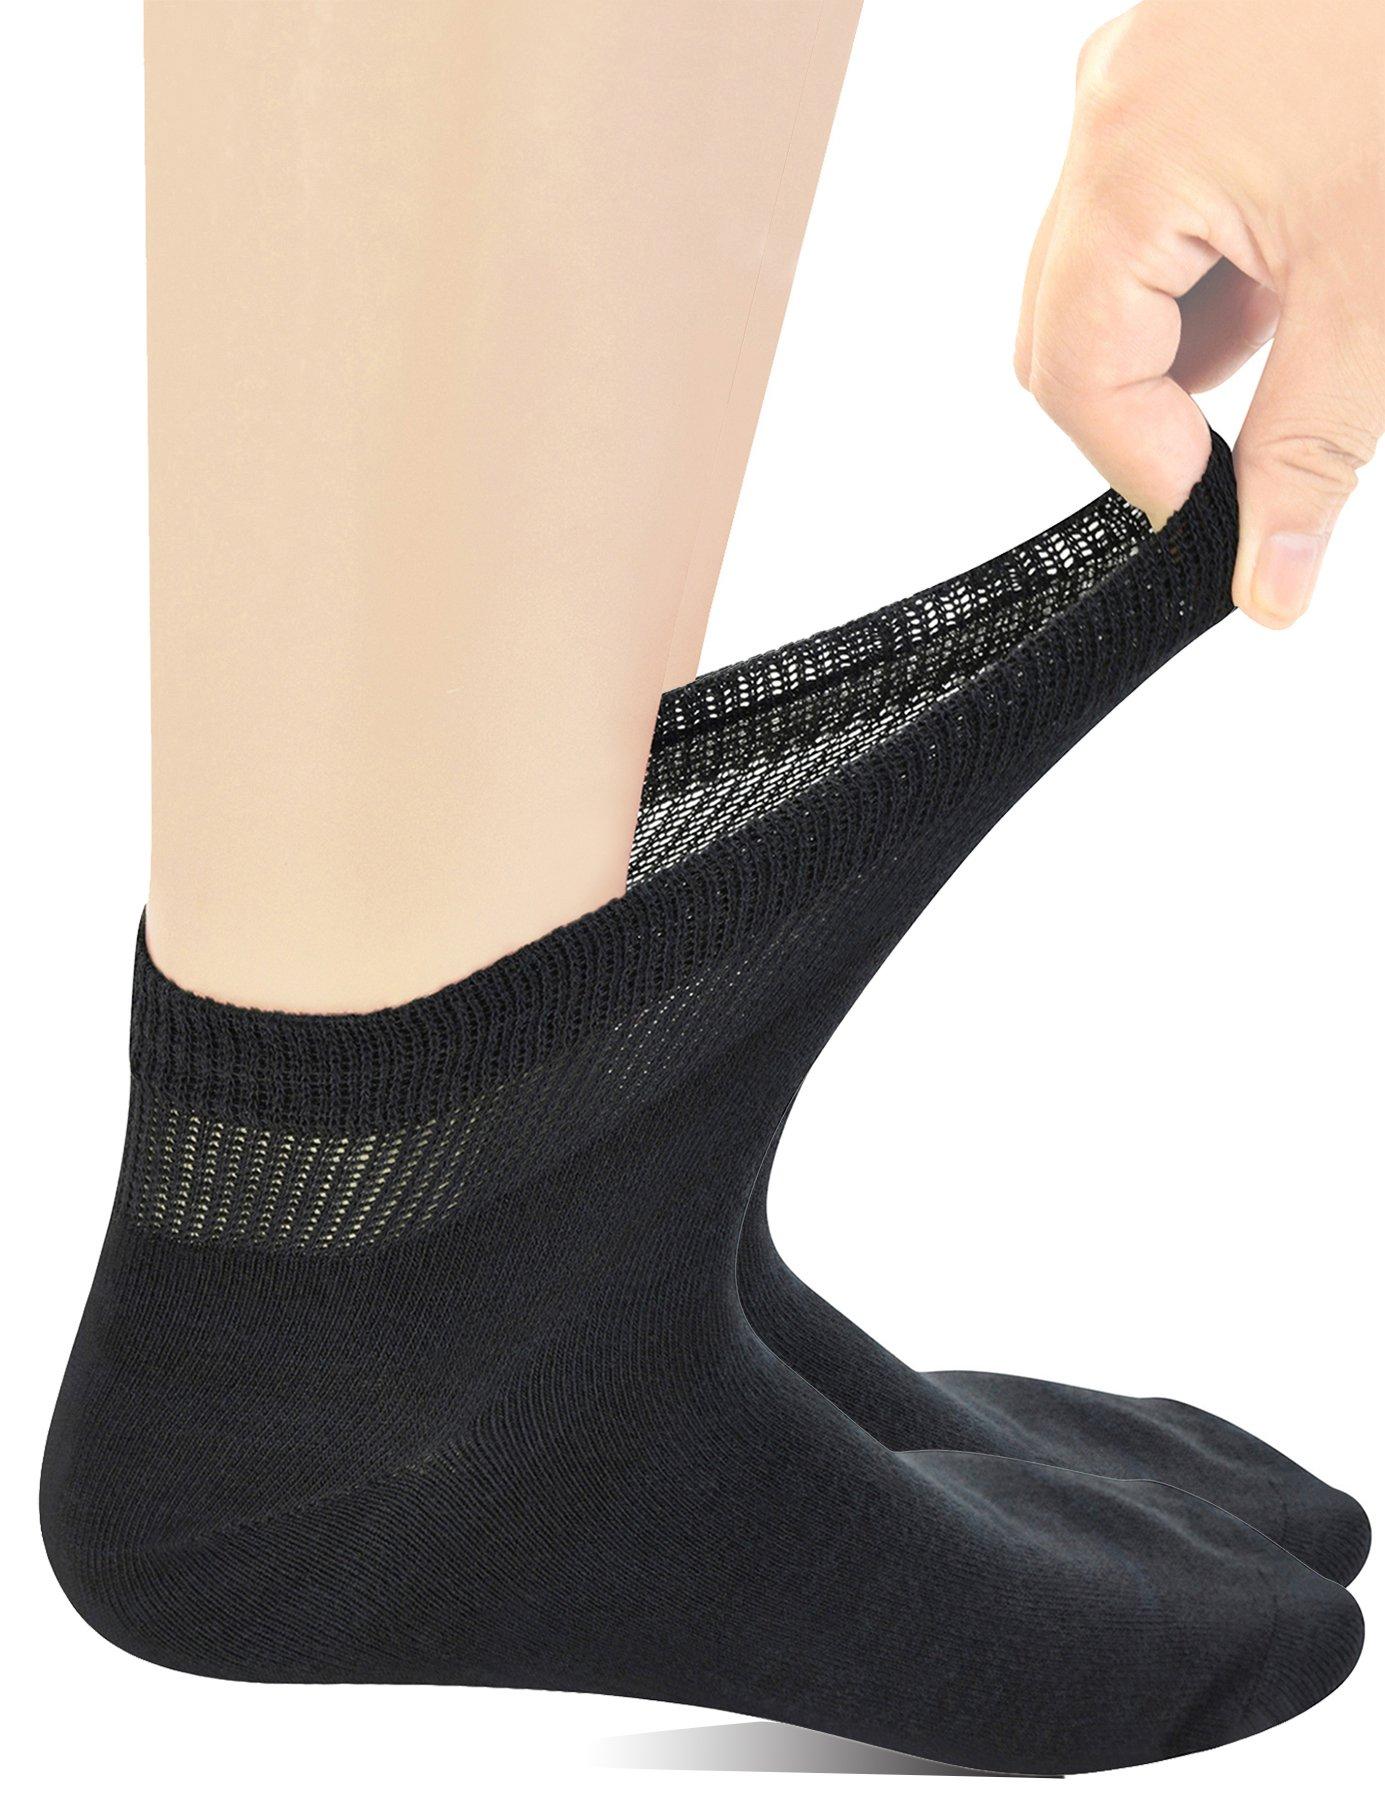 6213cdb9bf9 Yomandamor Mens Coolmax Ankle Extra-Wide Diabetic Socks with Seamless ...